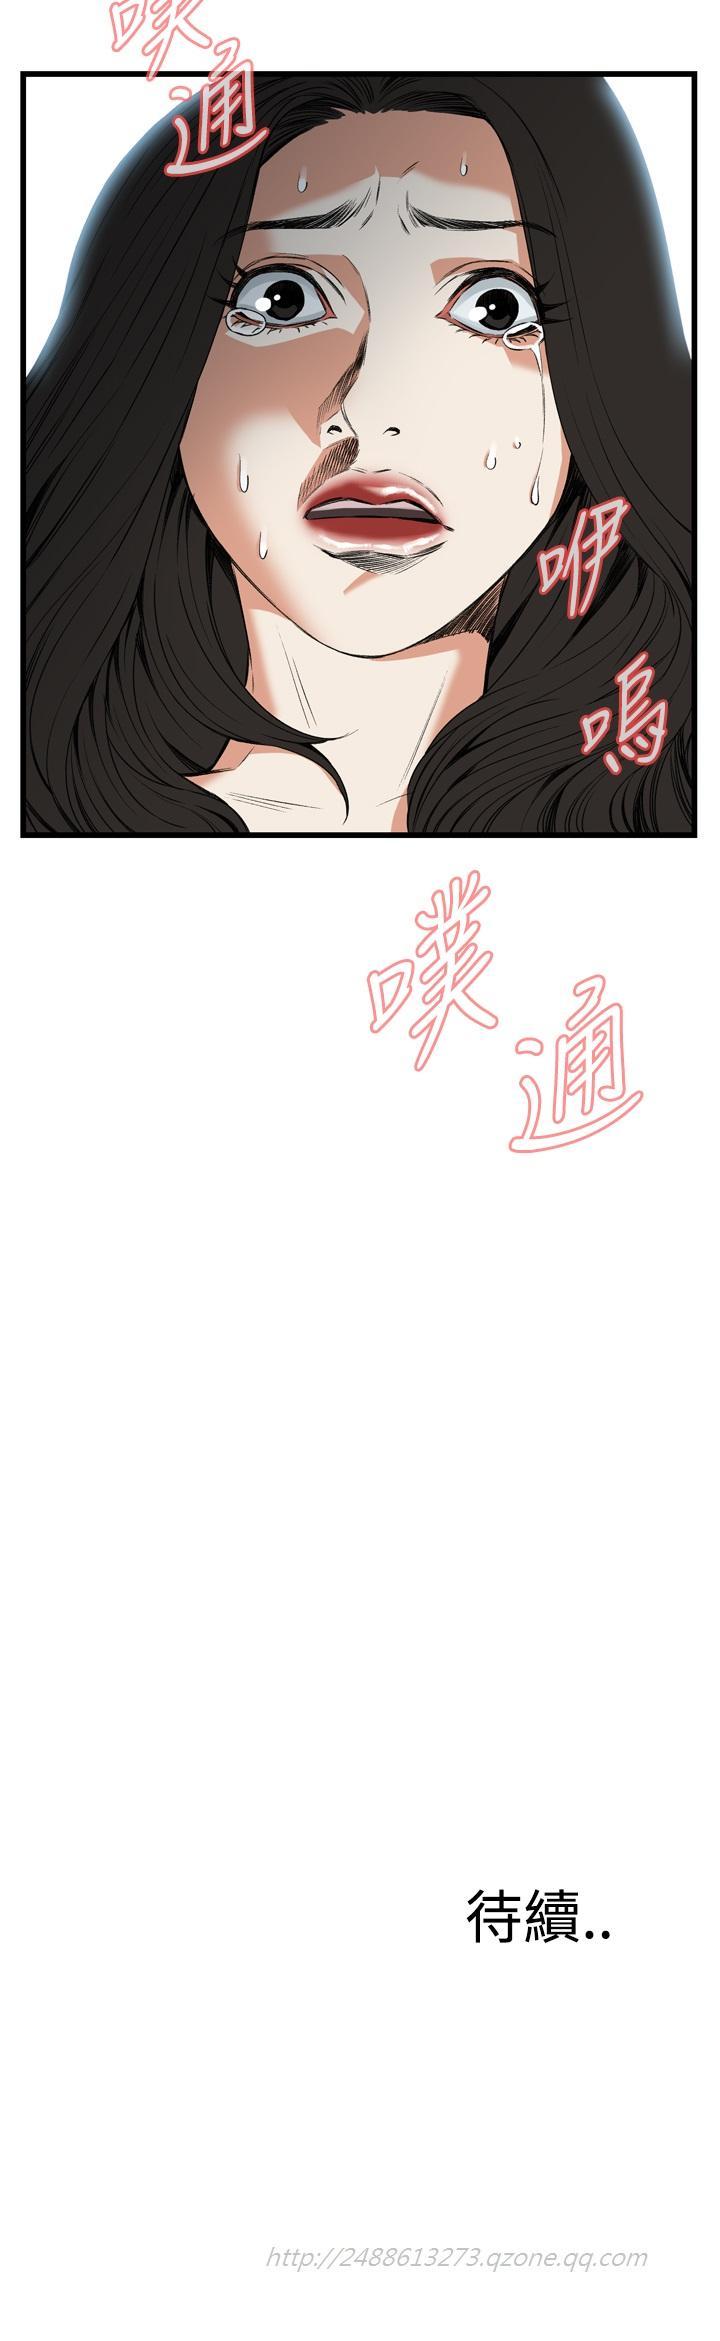 Take a Peek 偷窥 Ch.39~51 [Chinese]中文 310